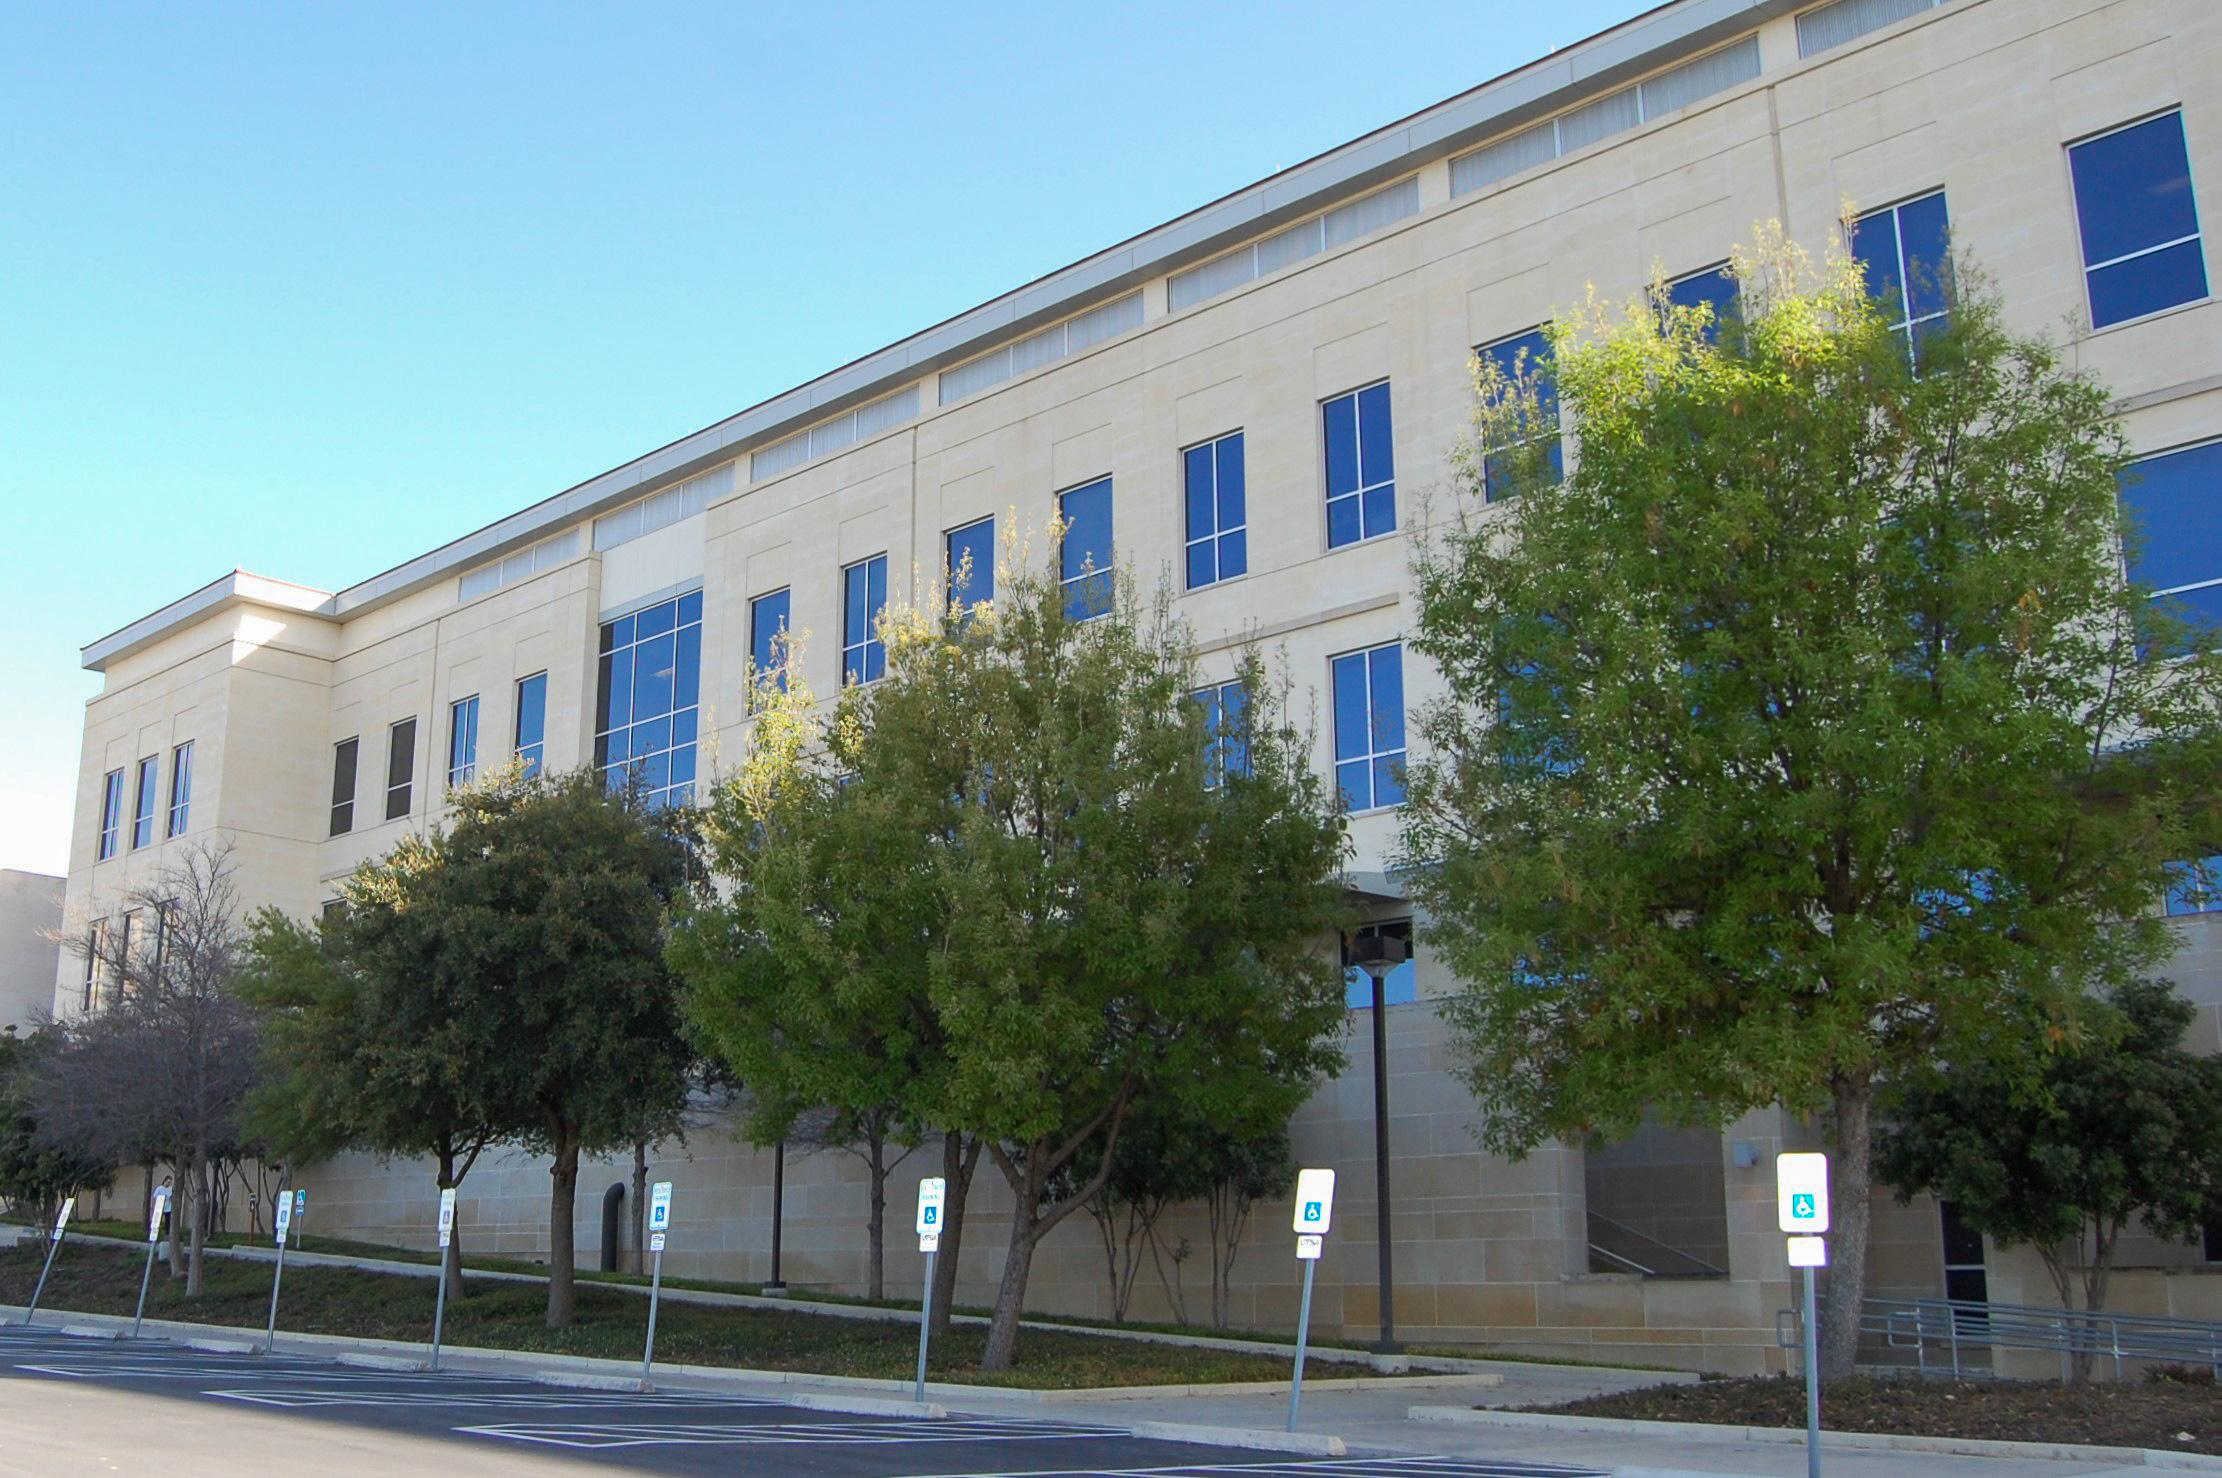 Texas Center for Athletics